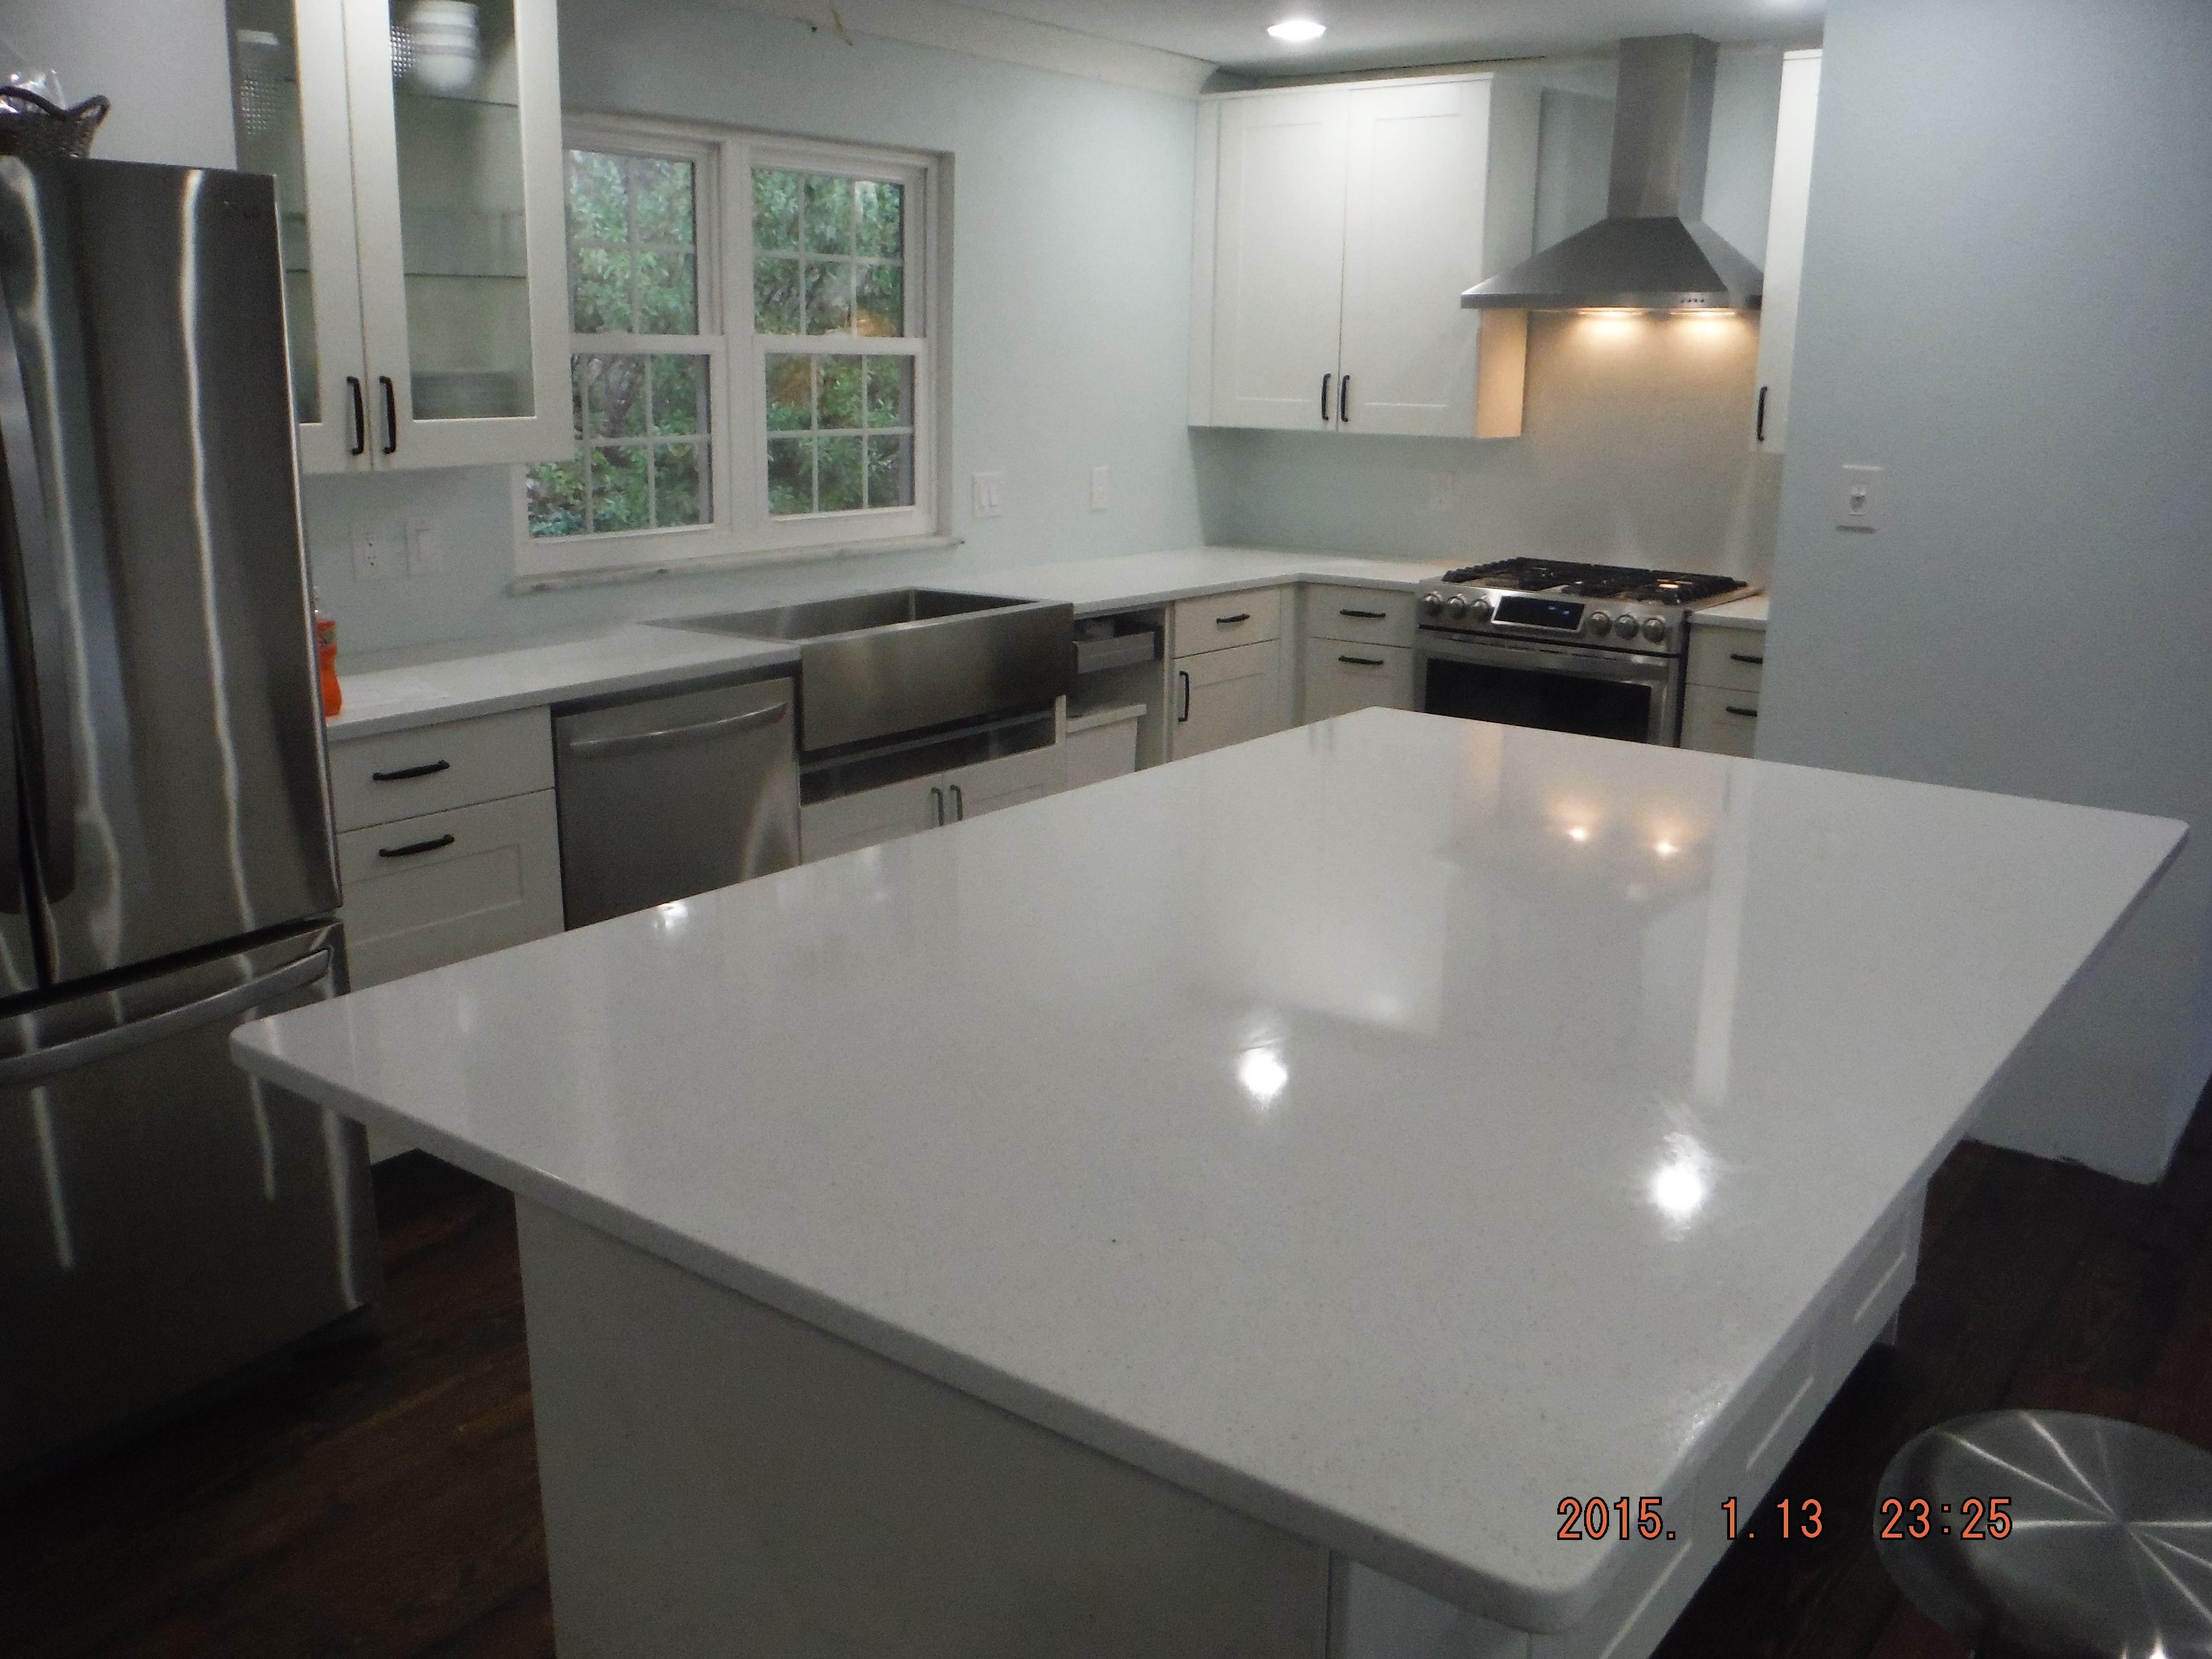 High Quality Crystal White LG Viatera Quartz Kitchen Countertops For The Herron Family!  Knoxvilleu0027s Stone Interiors.